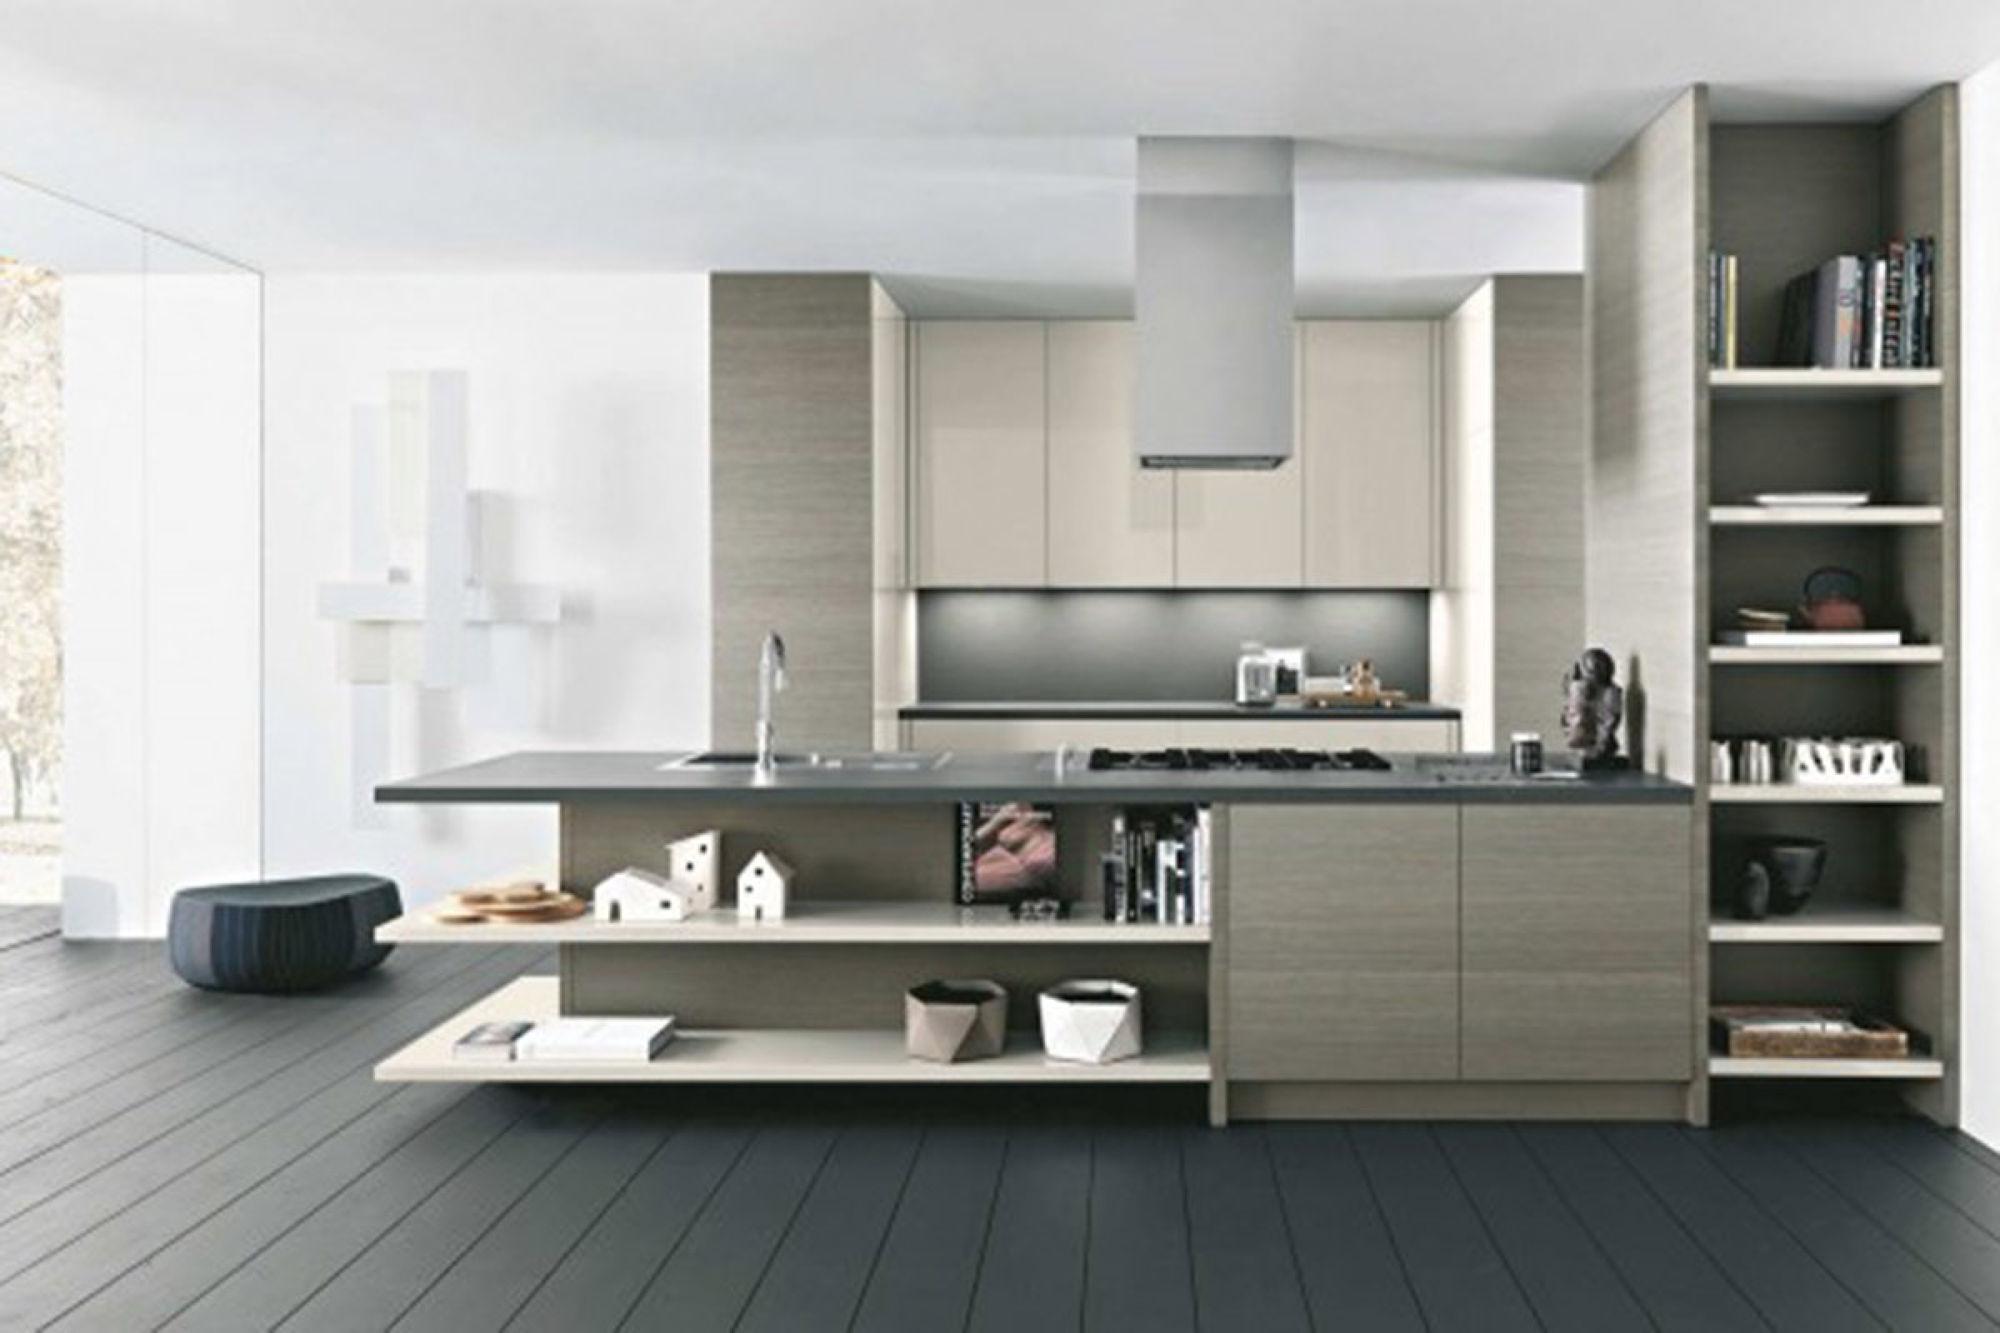 Concrete Countertops: Modernize Your Kitchen